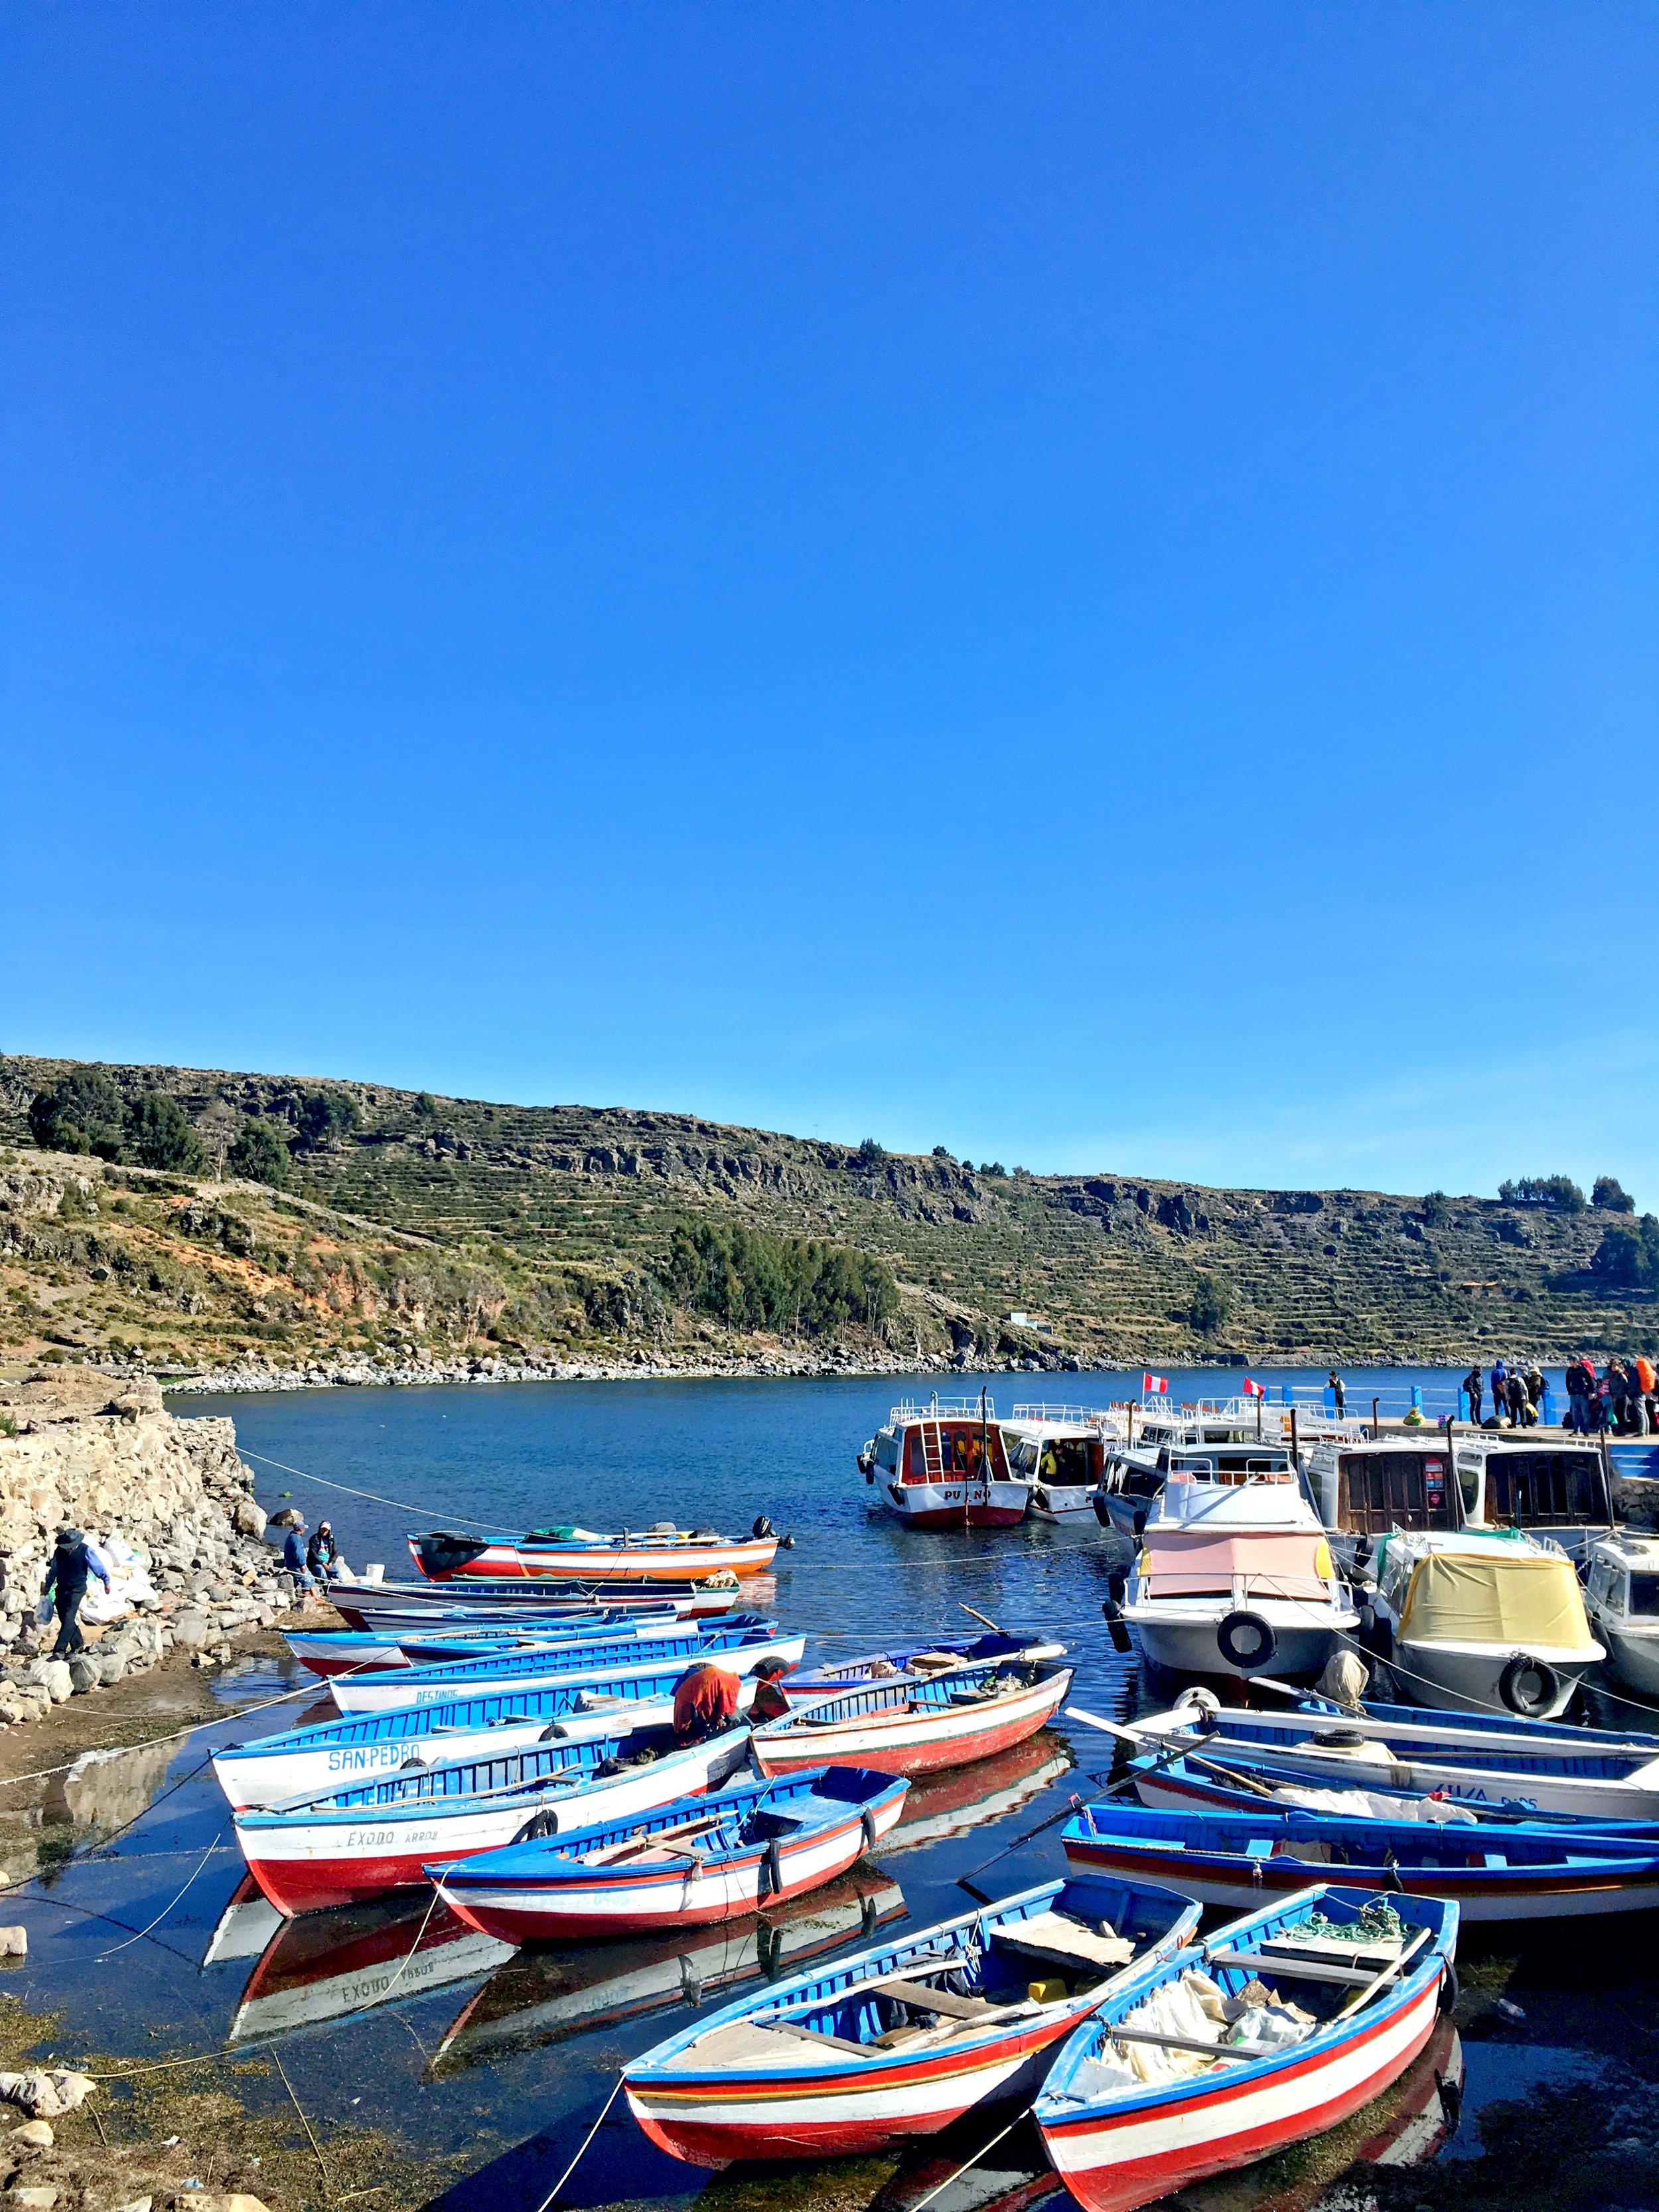 Boats docked on Amantani Island